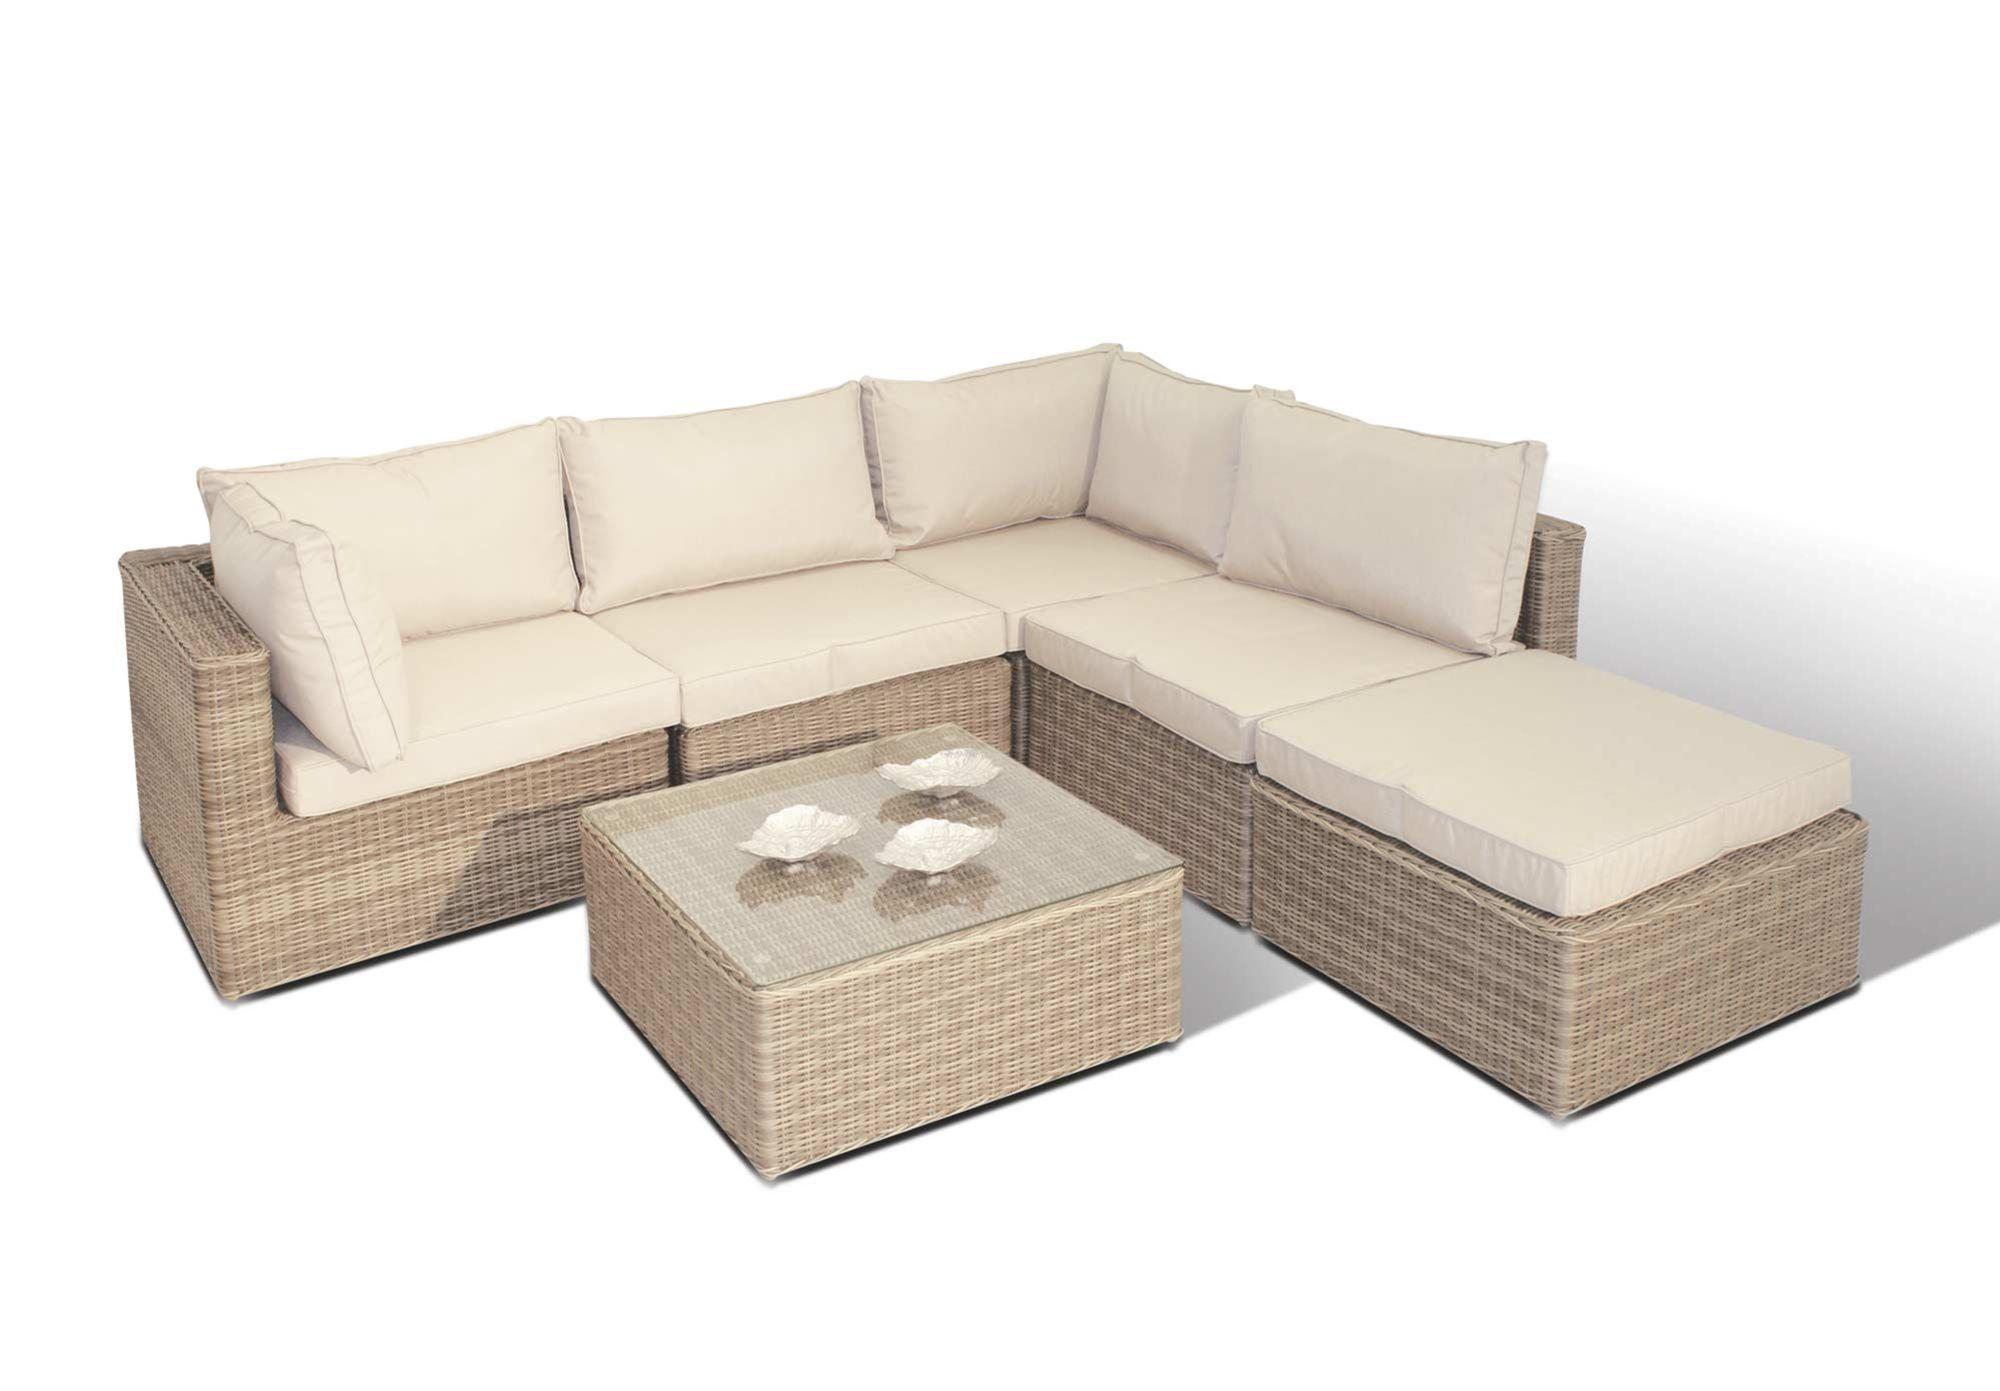 square corner group ascot rattan effect garden furniture furniture village - Furniture Village Garden Furniture